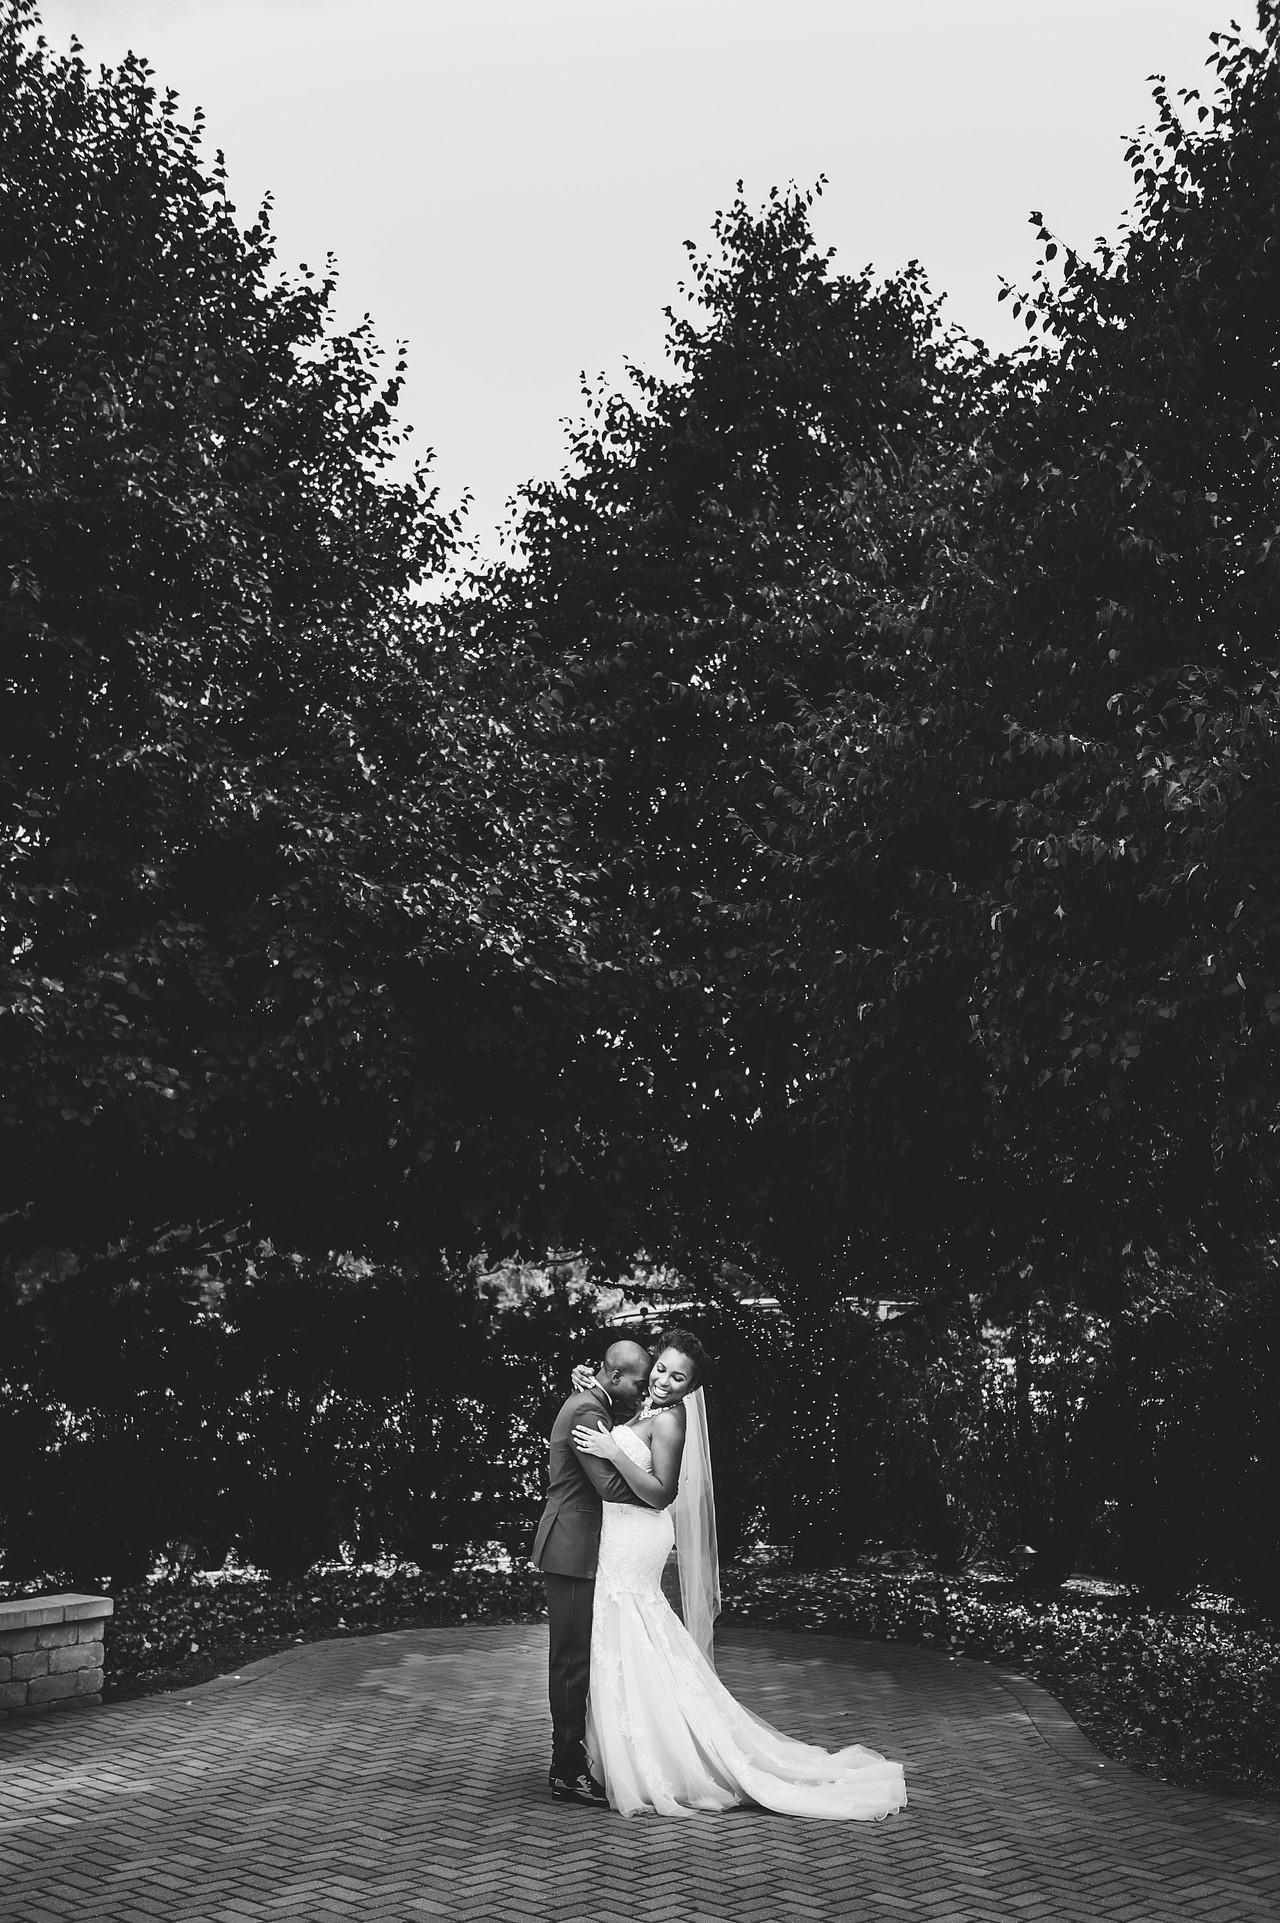 chasing-stills-wedding-photography